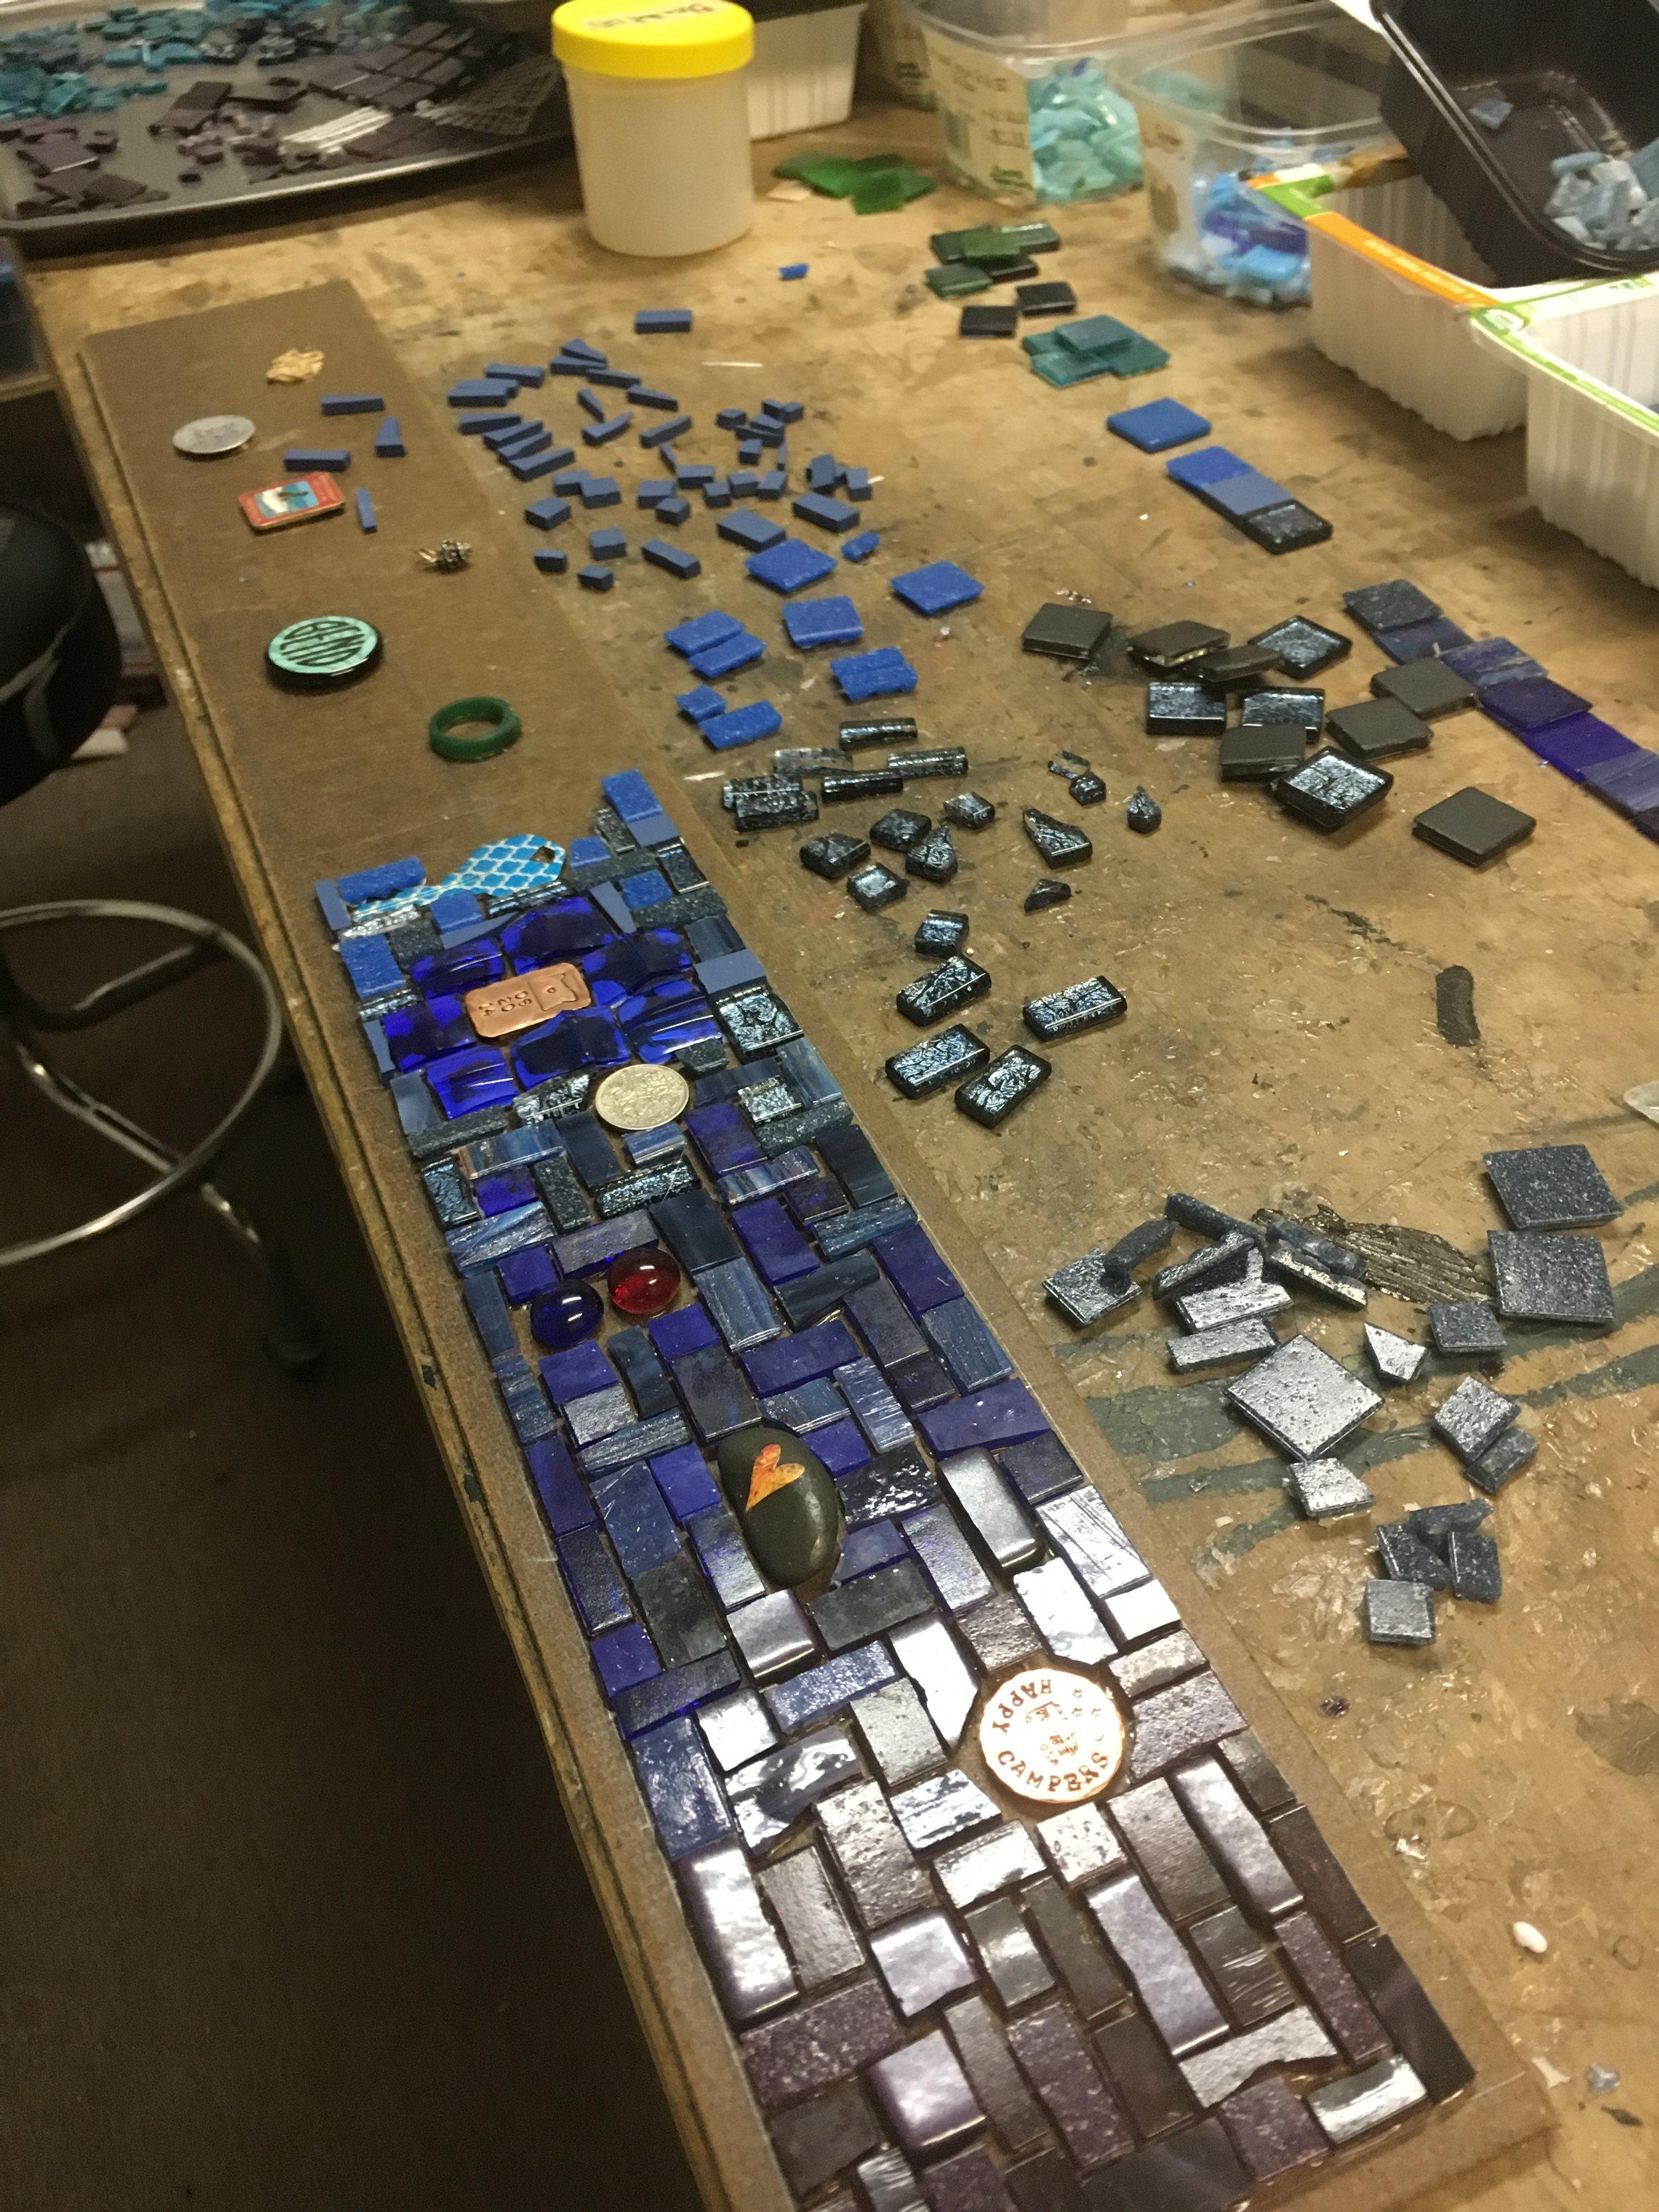 Mosaic with mementos